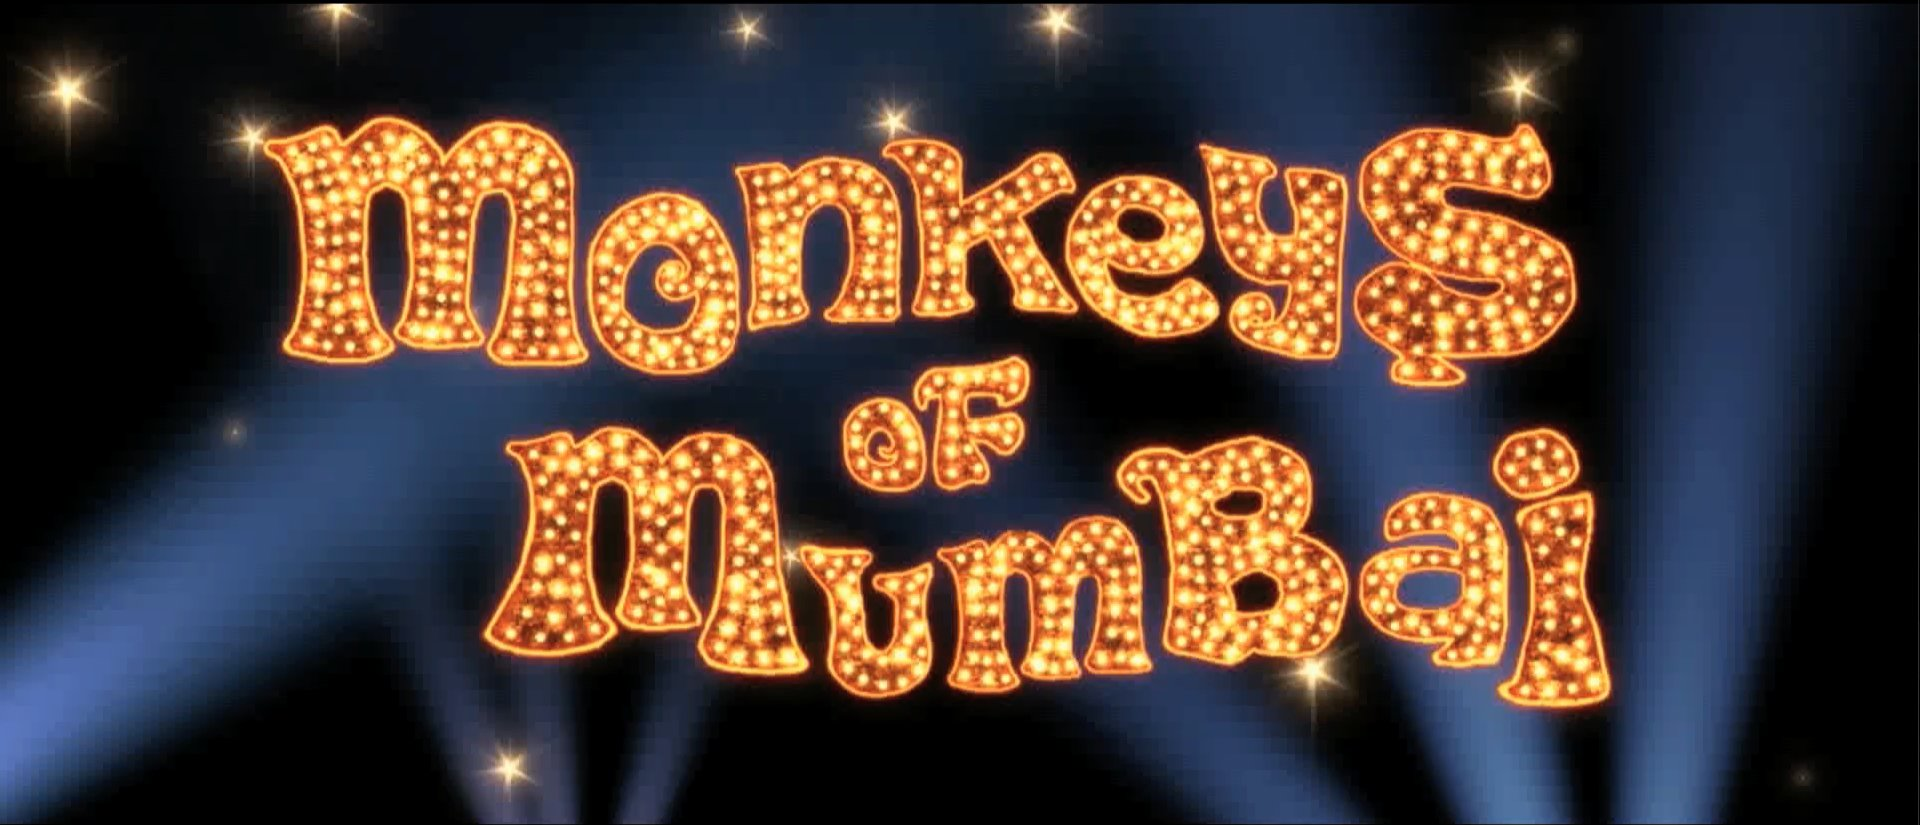 Monkeys of Mumbai